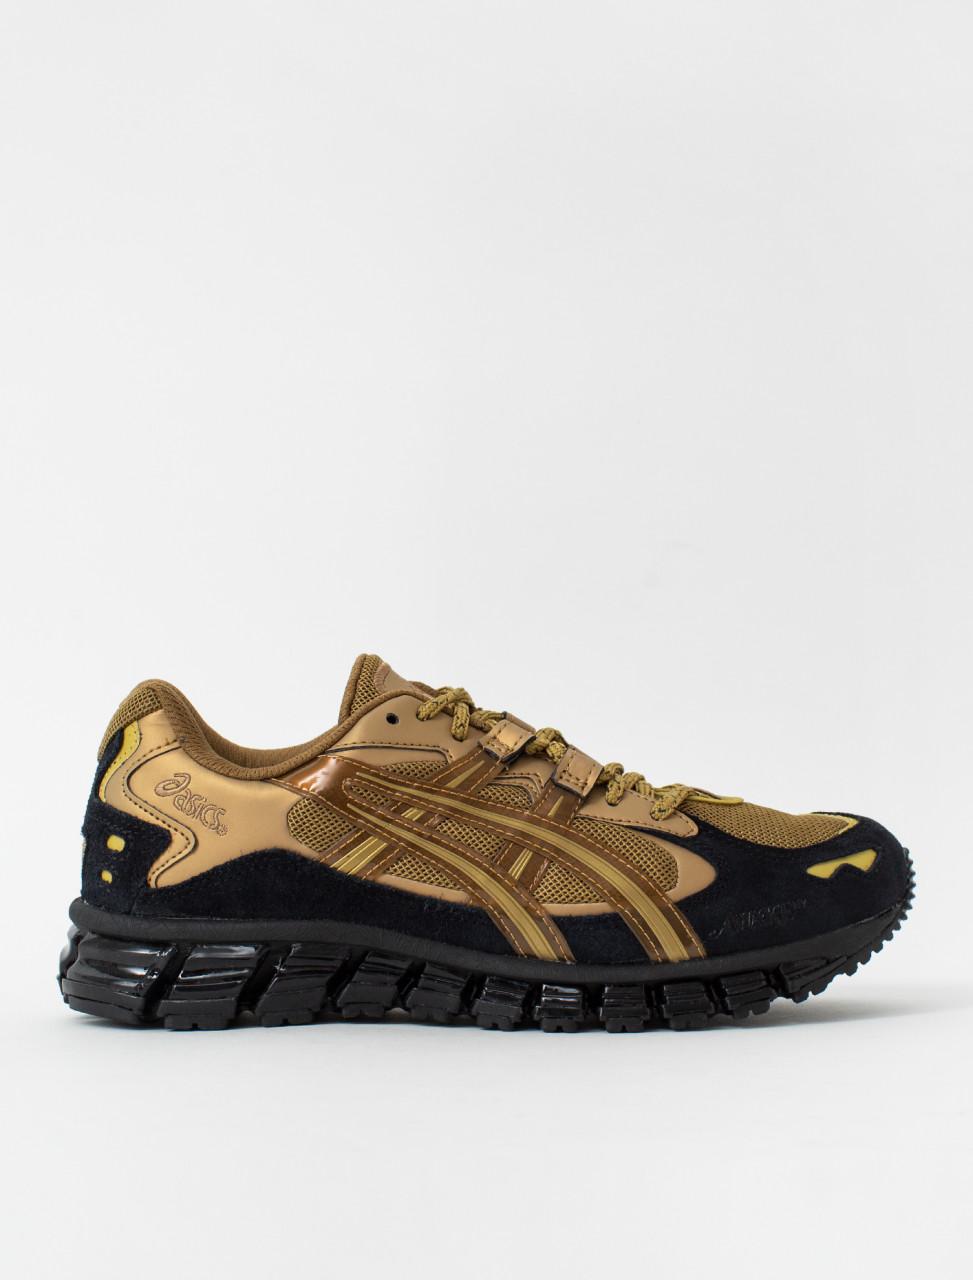 x Awake NY GEL-Kayano 5 360 Sneaker